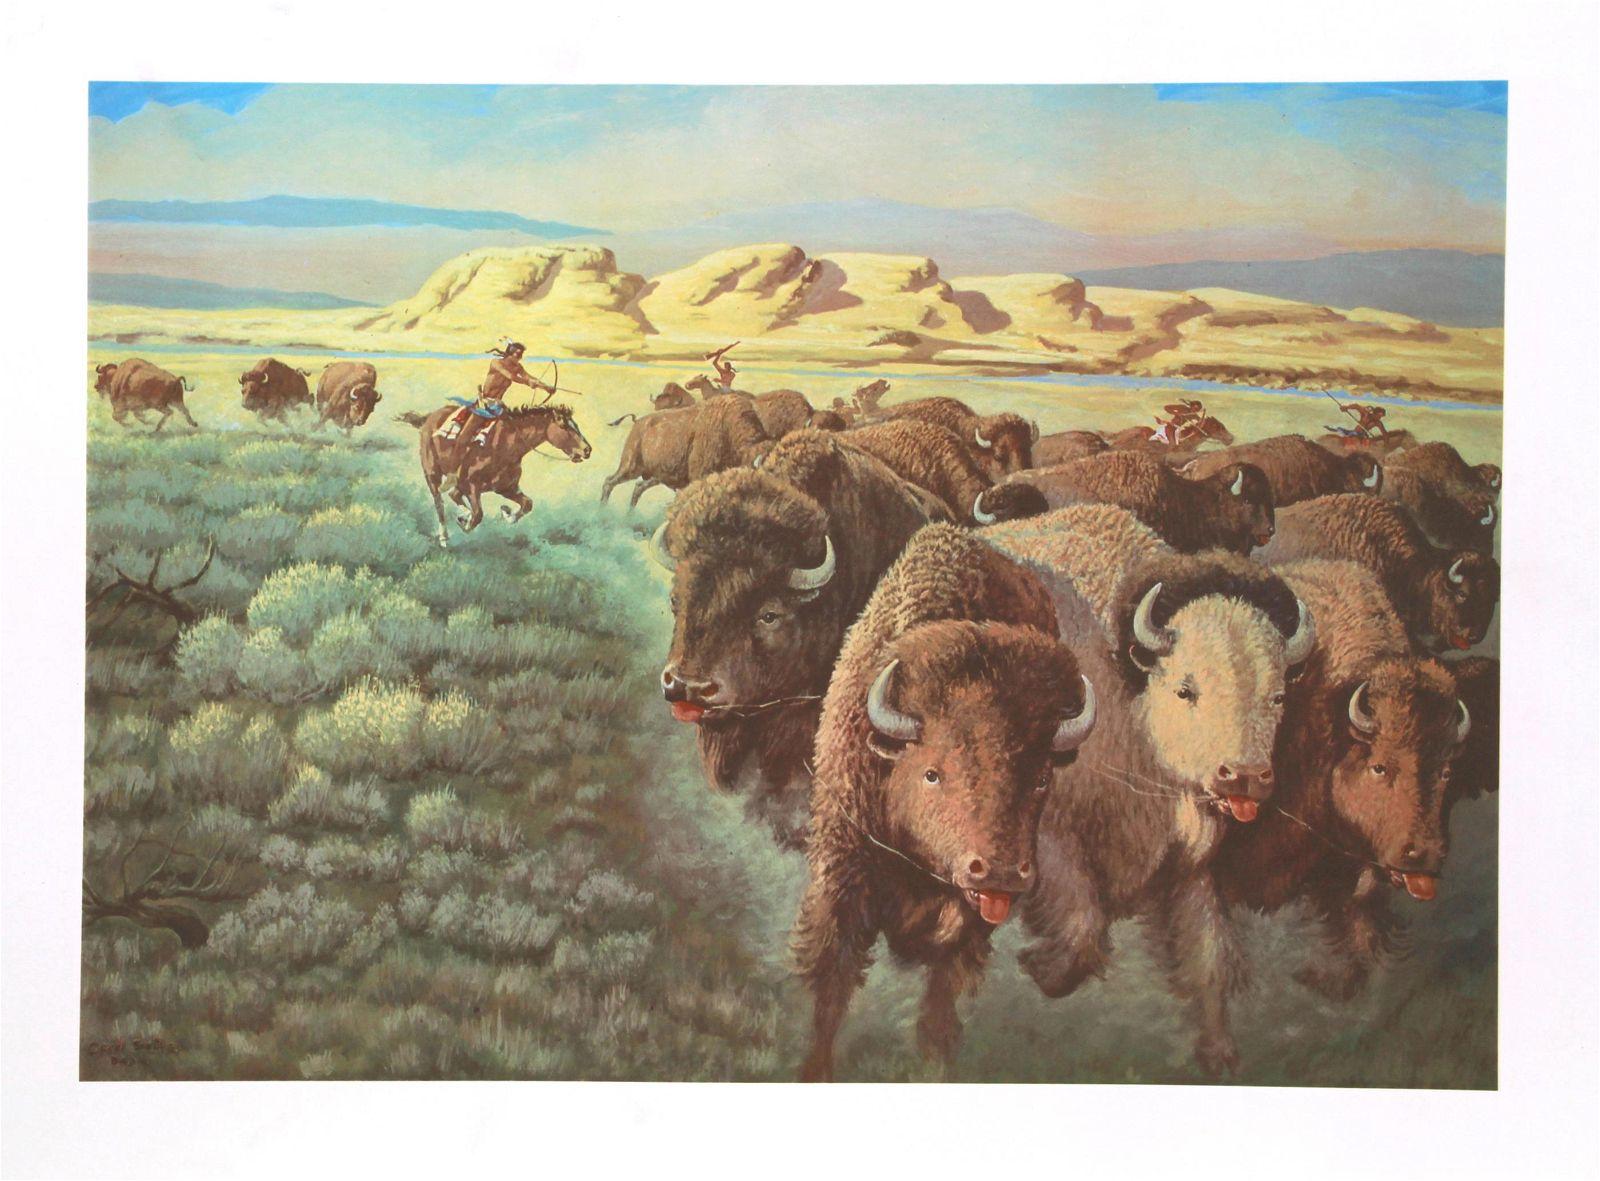 Cecil Smith, Cheyenne Buffalo Runners, Lithograph